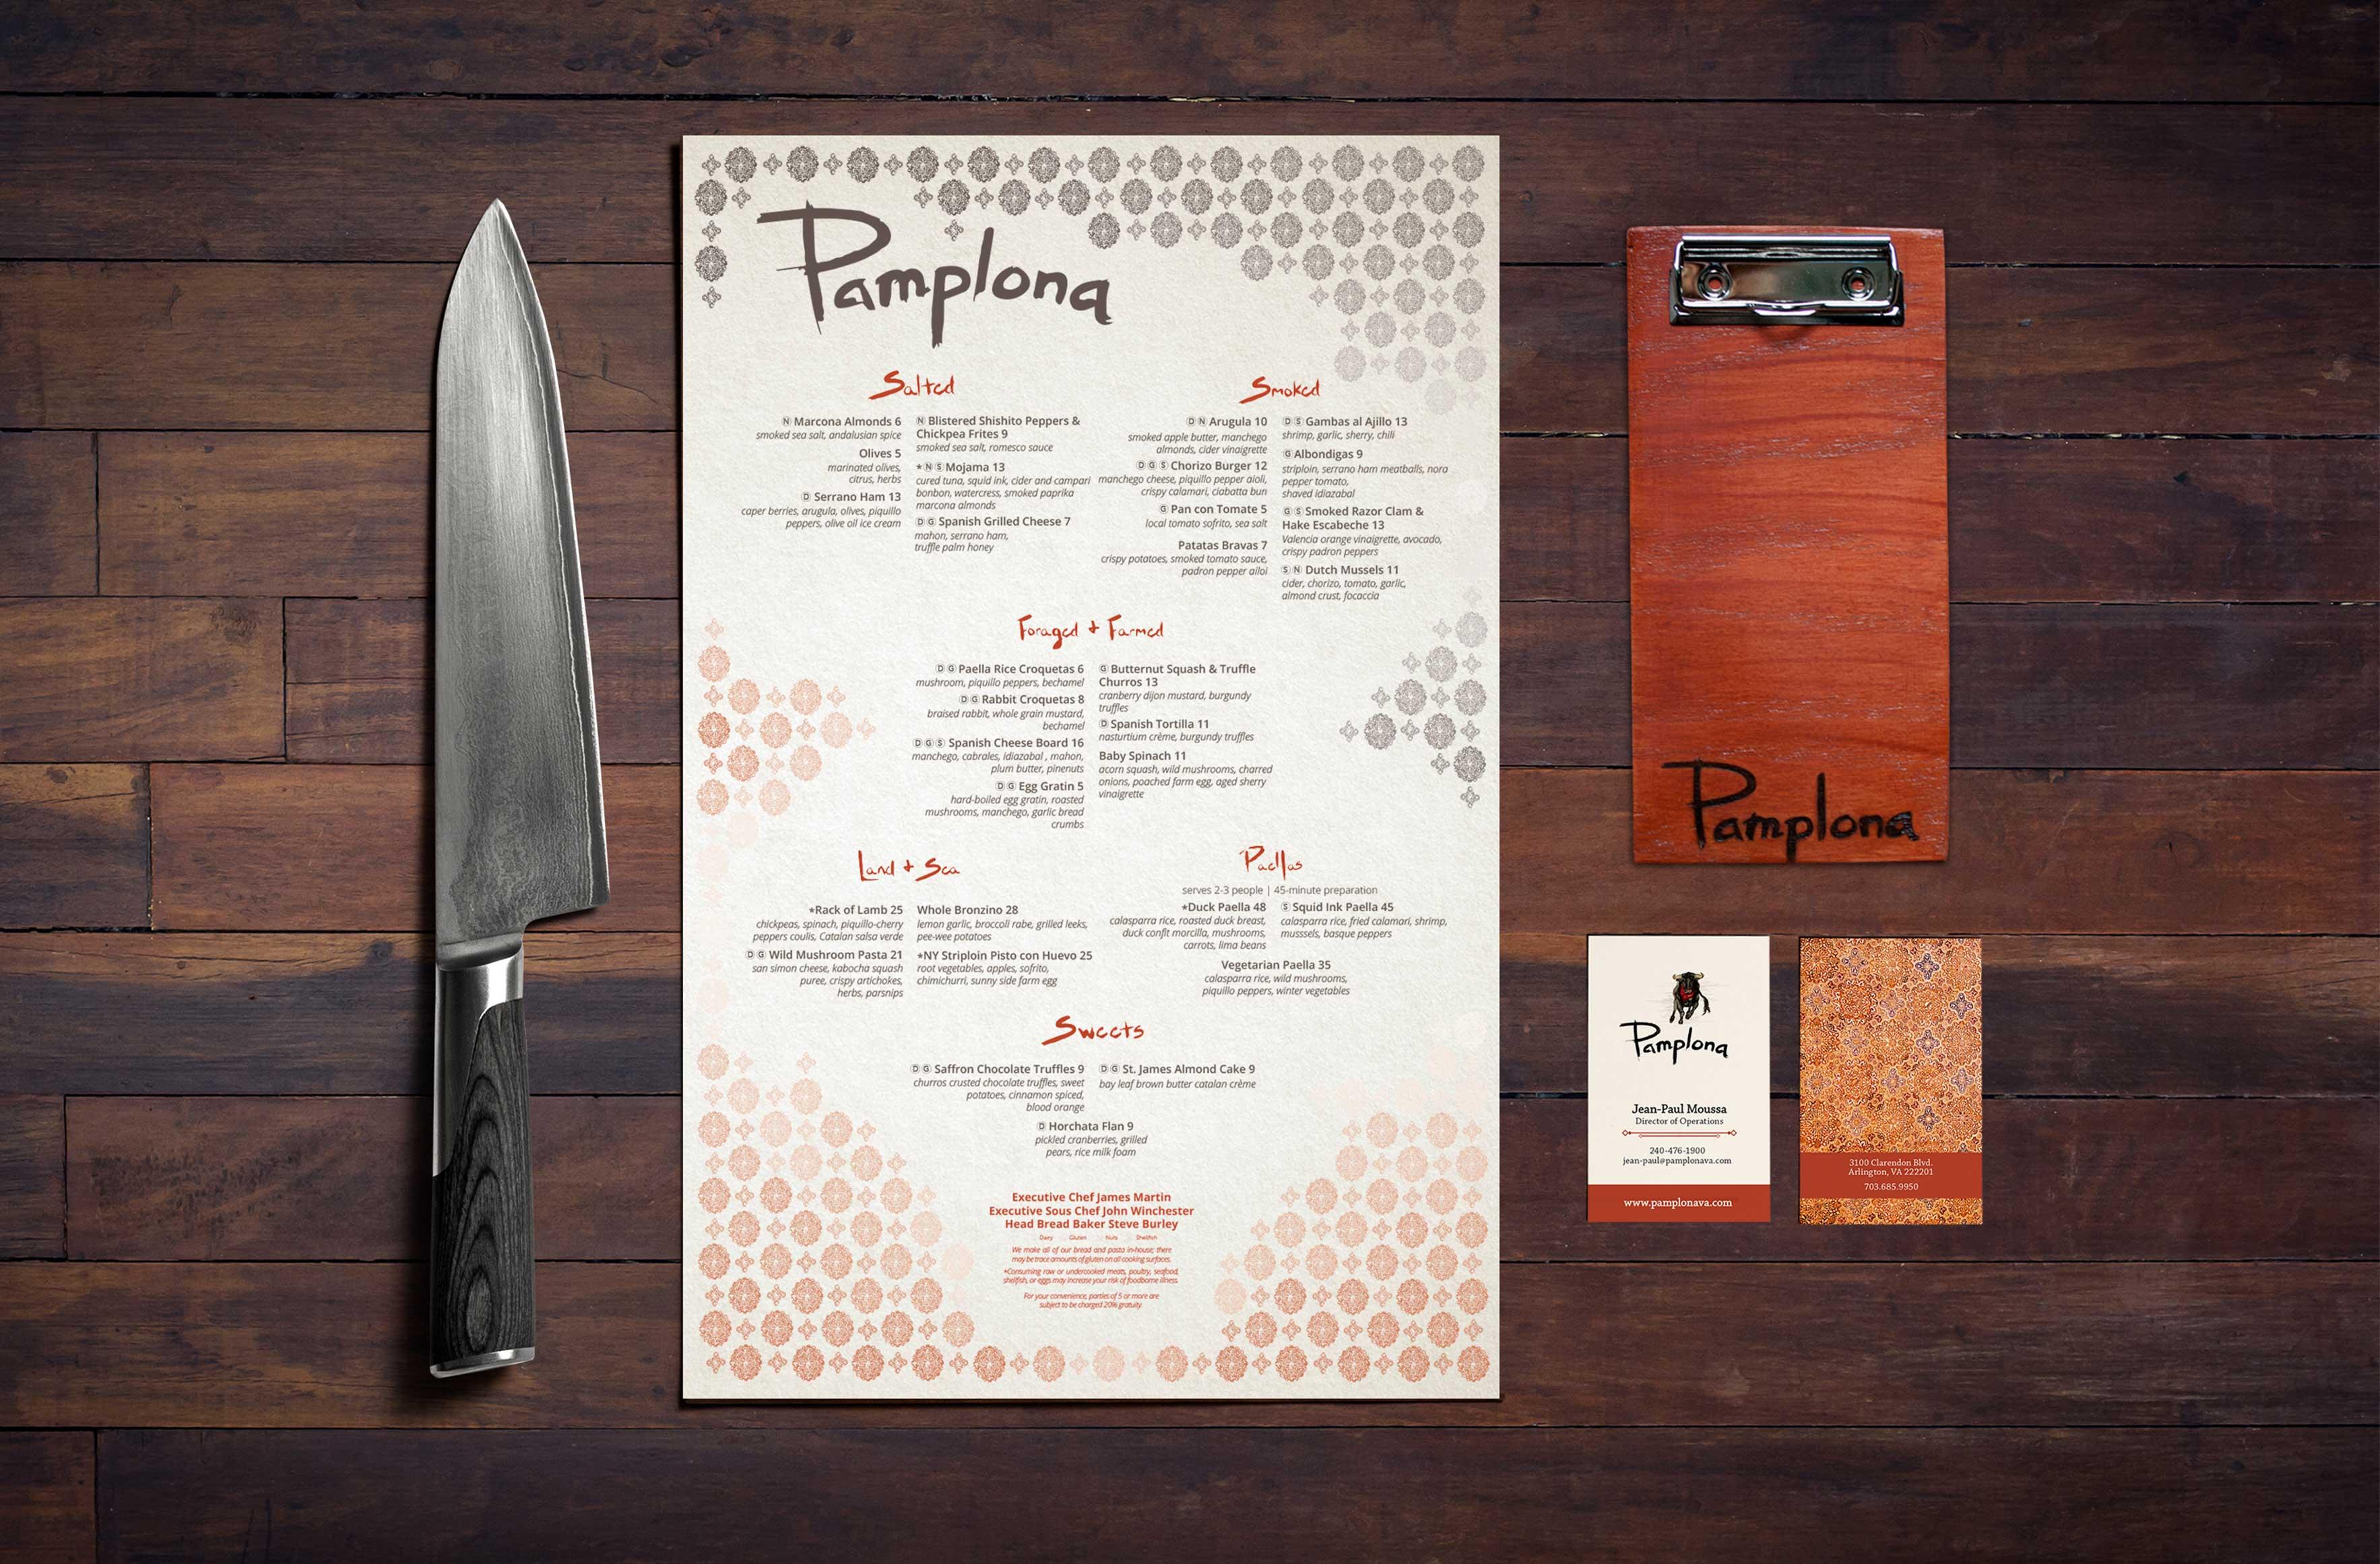 pamplona menu